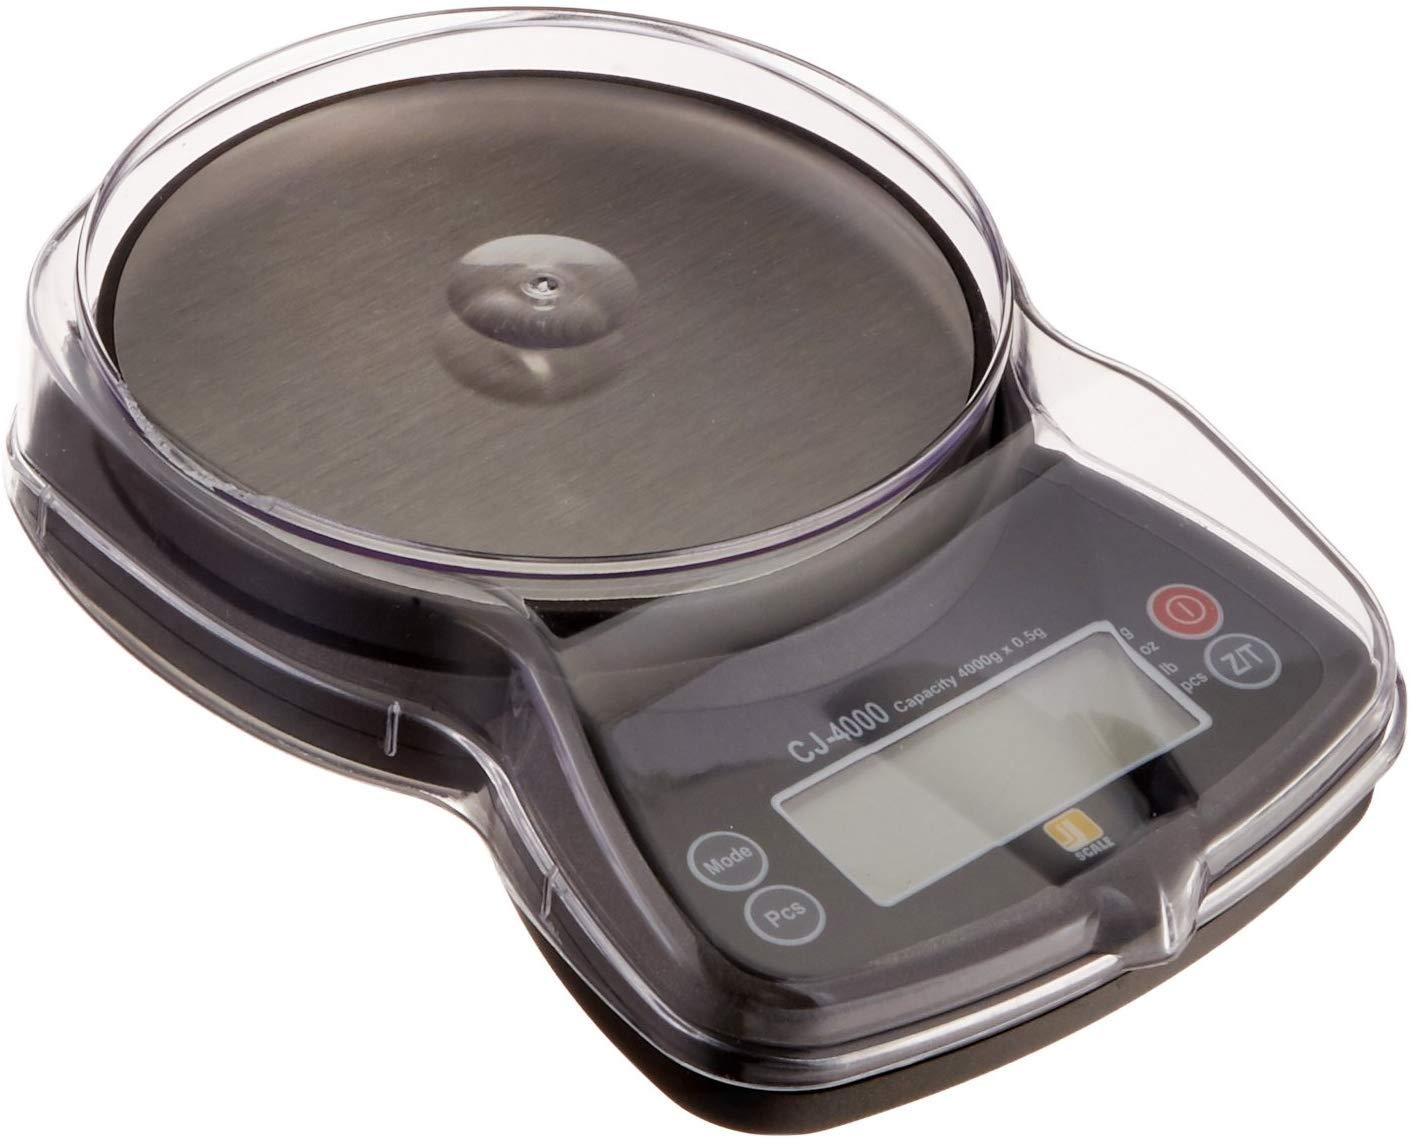 Jennings CJ-4000 Compact Digital Weigh Scale